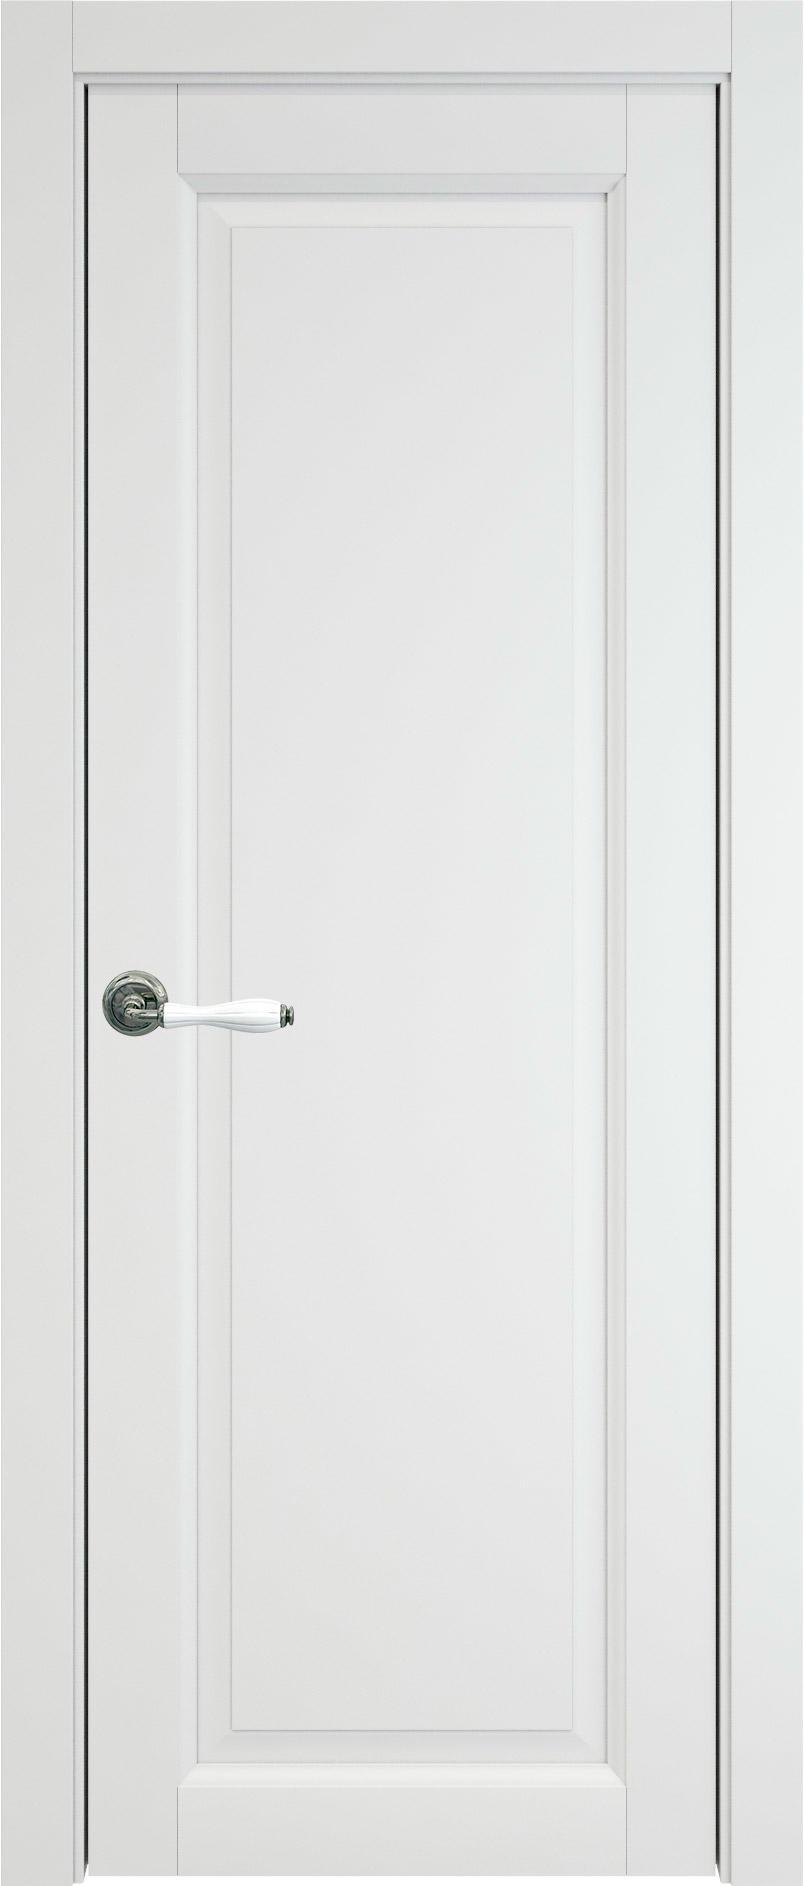 Domenica цвет - Белая эмаль (RAL 9003) Без стекла (ДГ)